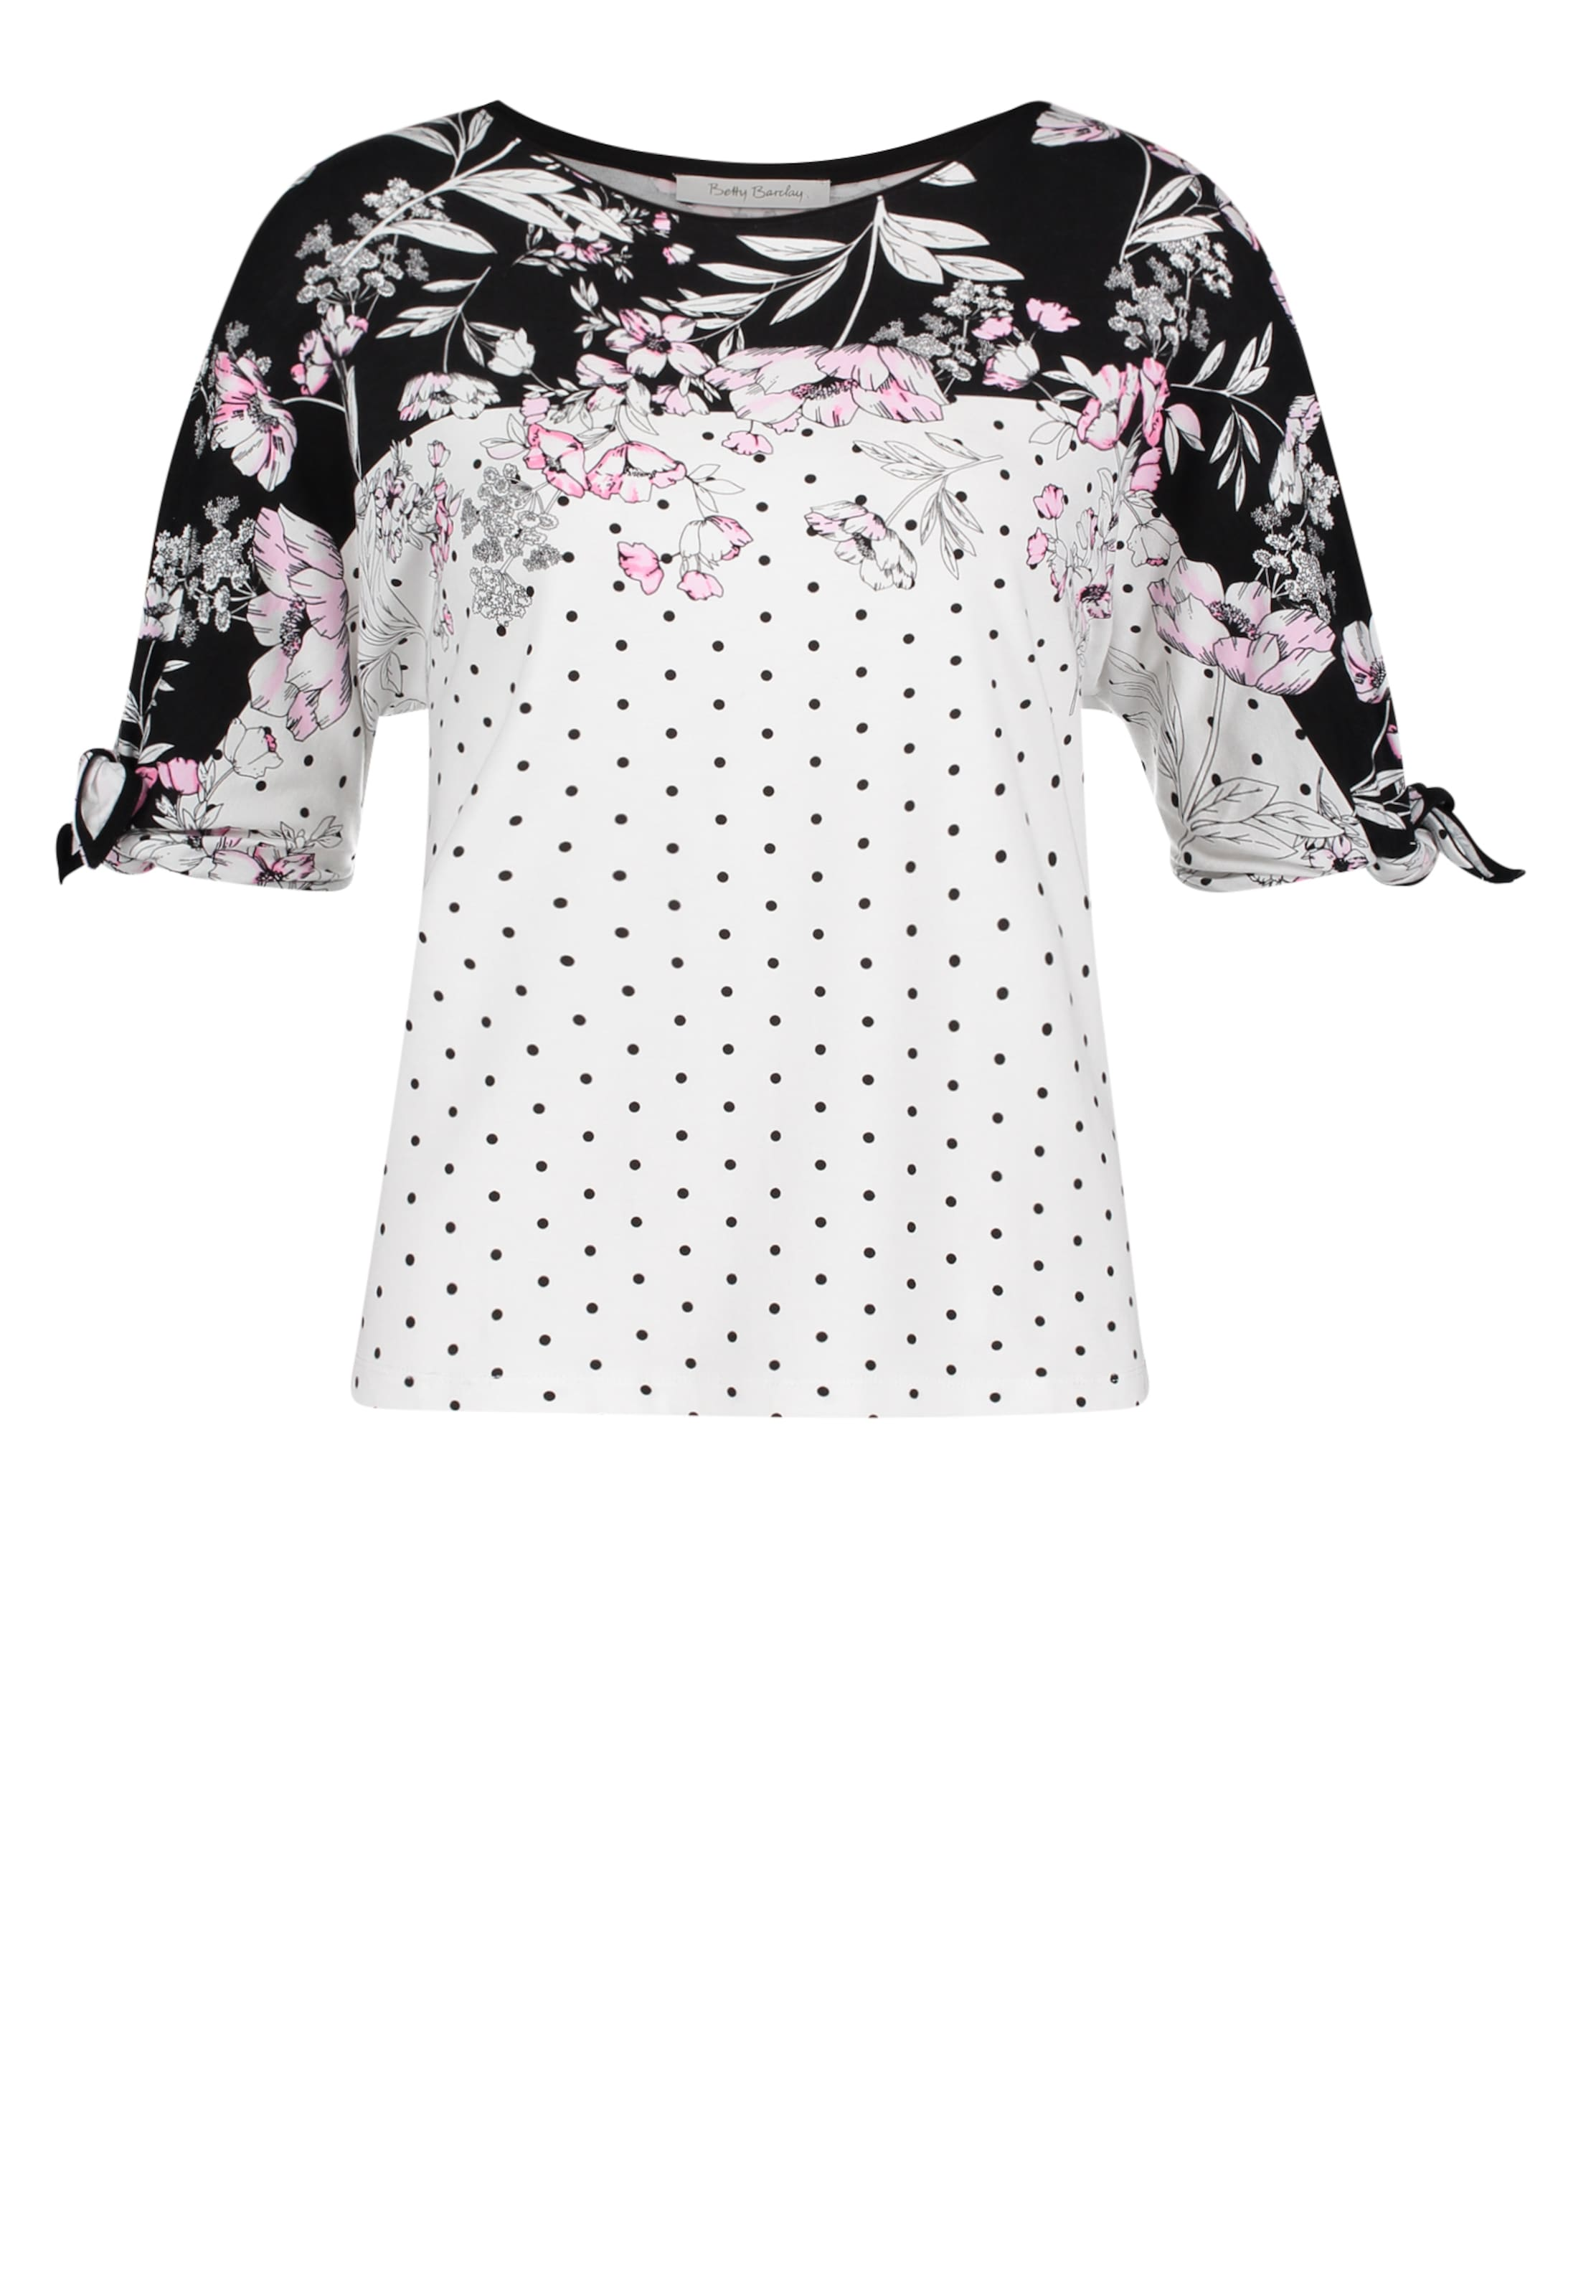 HellpinkSchwarz Betty Shirt Weiß Barclay In nZN80OwPkX